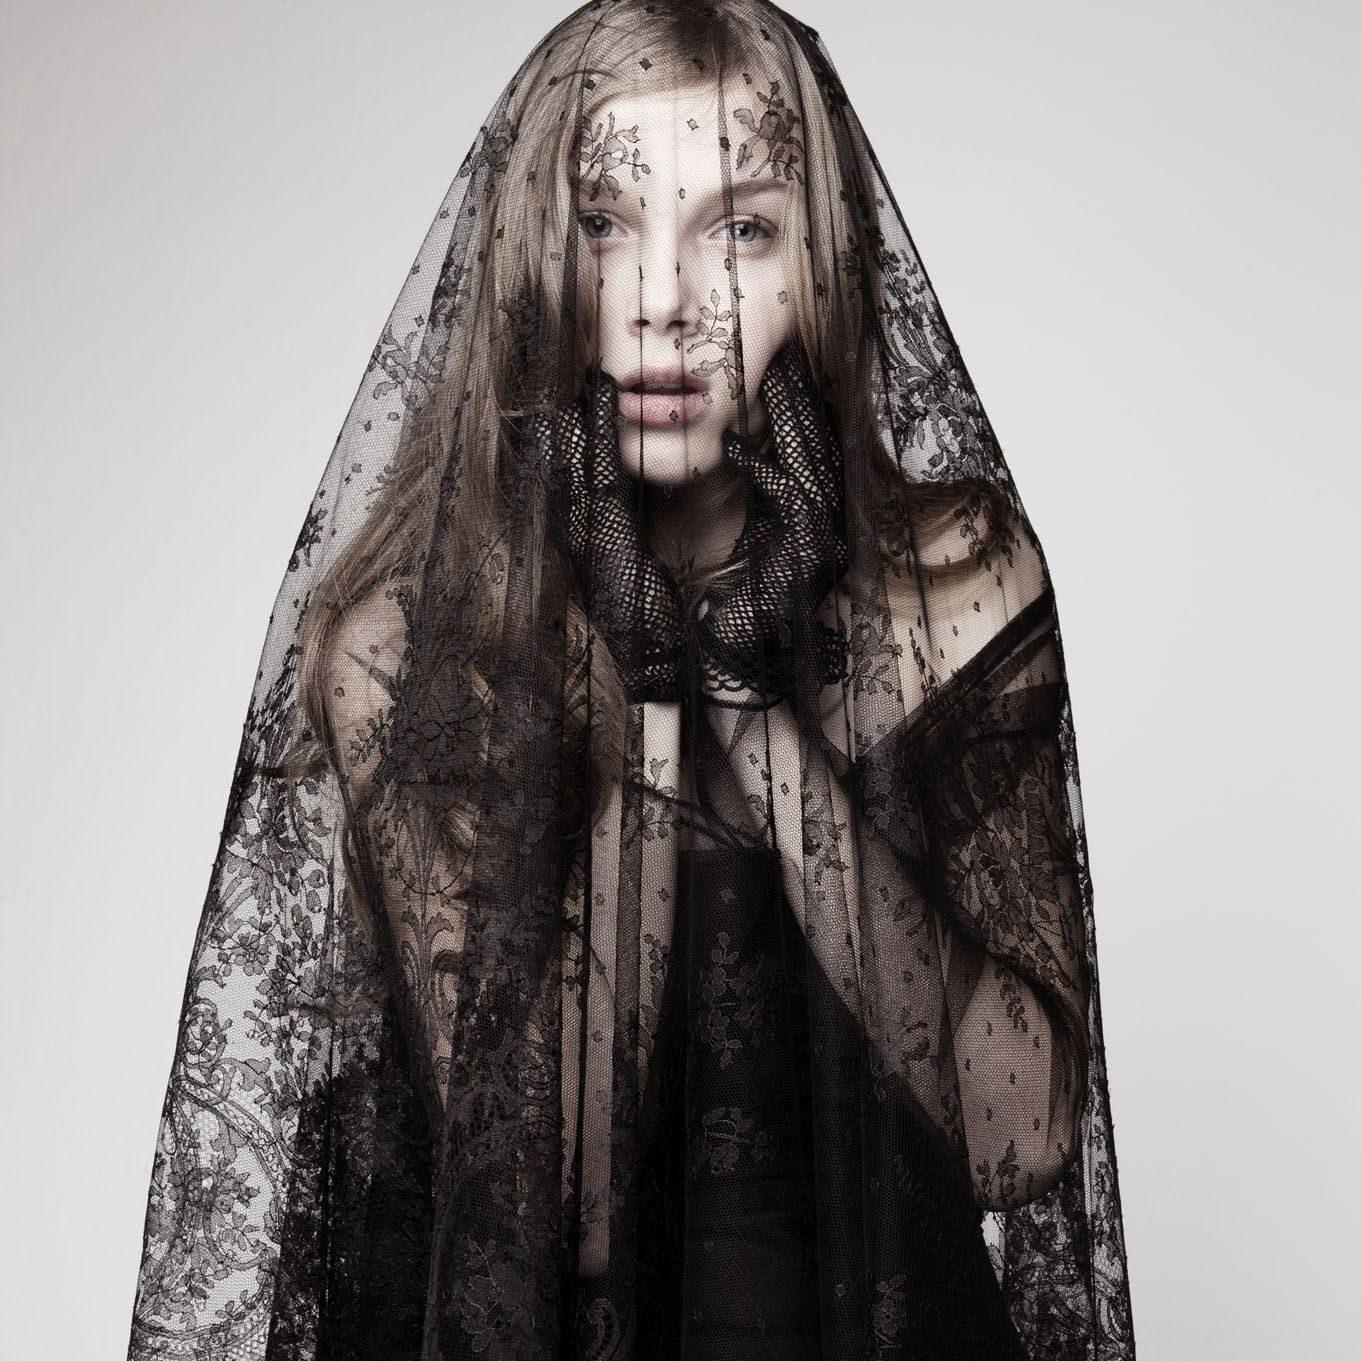 https://chicvintagebrides.com/wp-content/uploads/2014/10/Black-Wedding-Dresses-e1540357134253.jpg